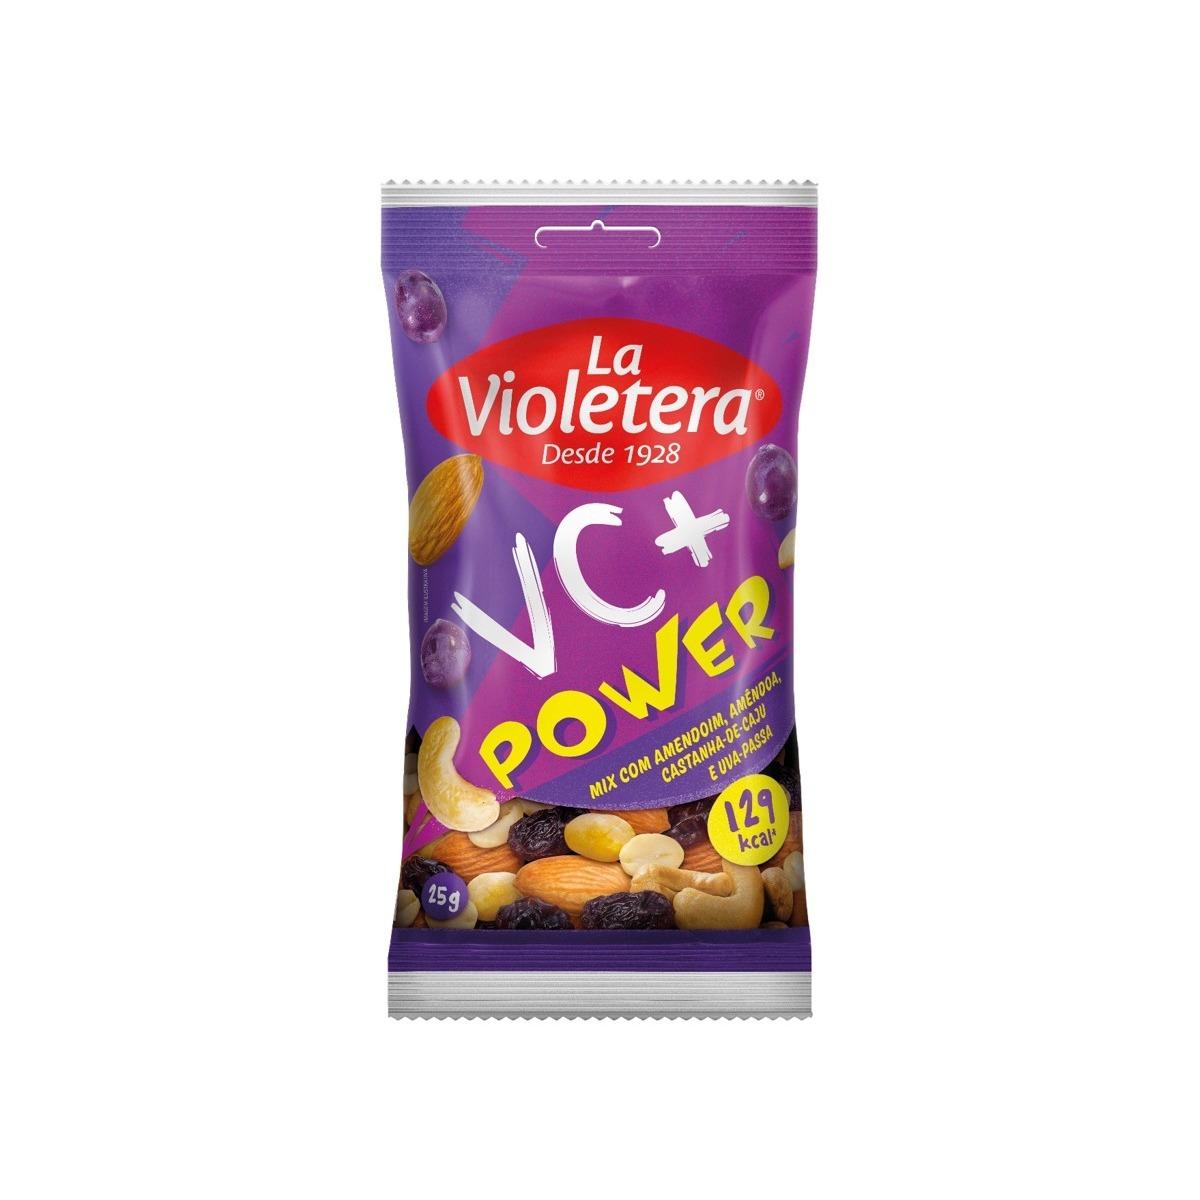 MIX VC+ POWER LA VIOLETERA 25G